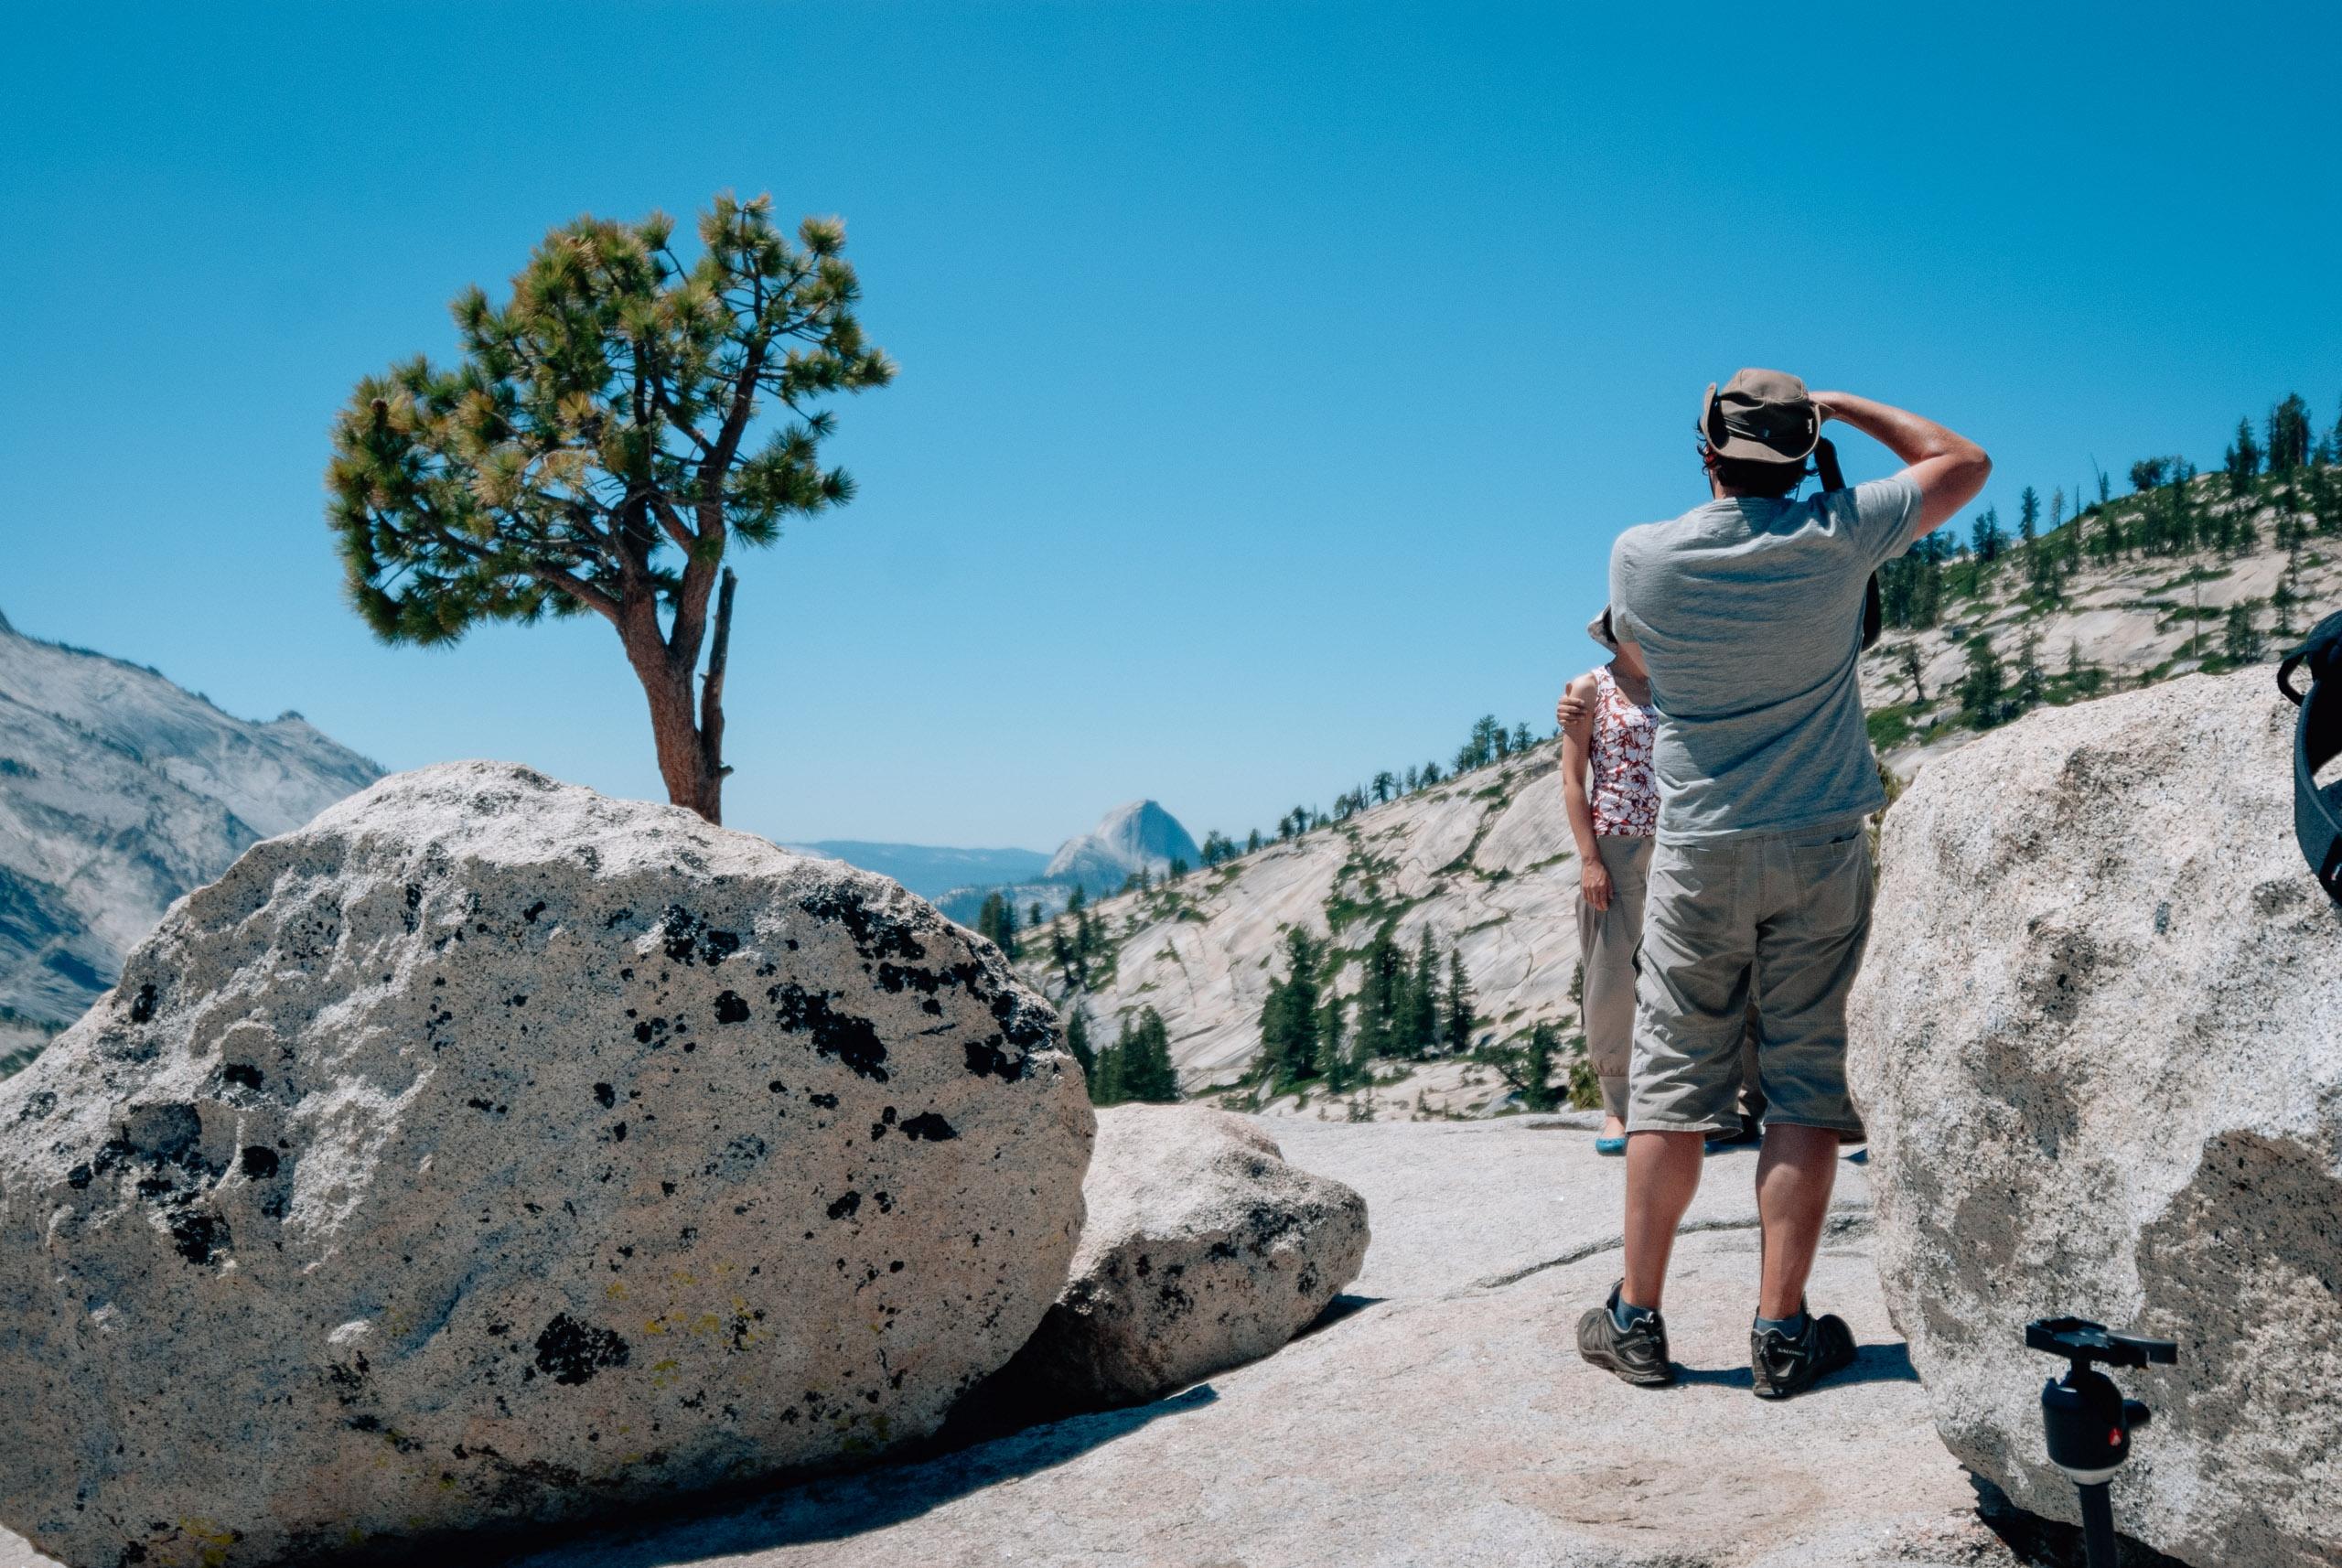 Yosemite National Park - 2010-0723-DSC_0095_54406